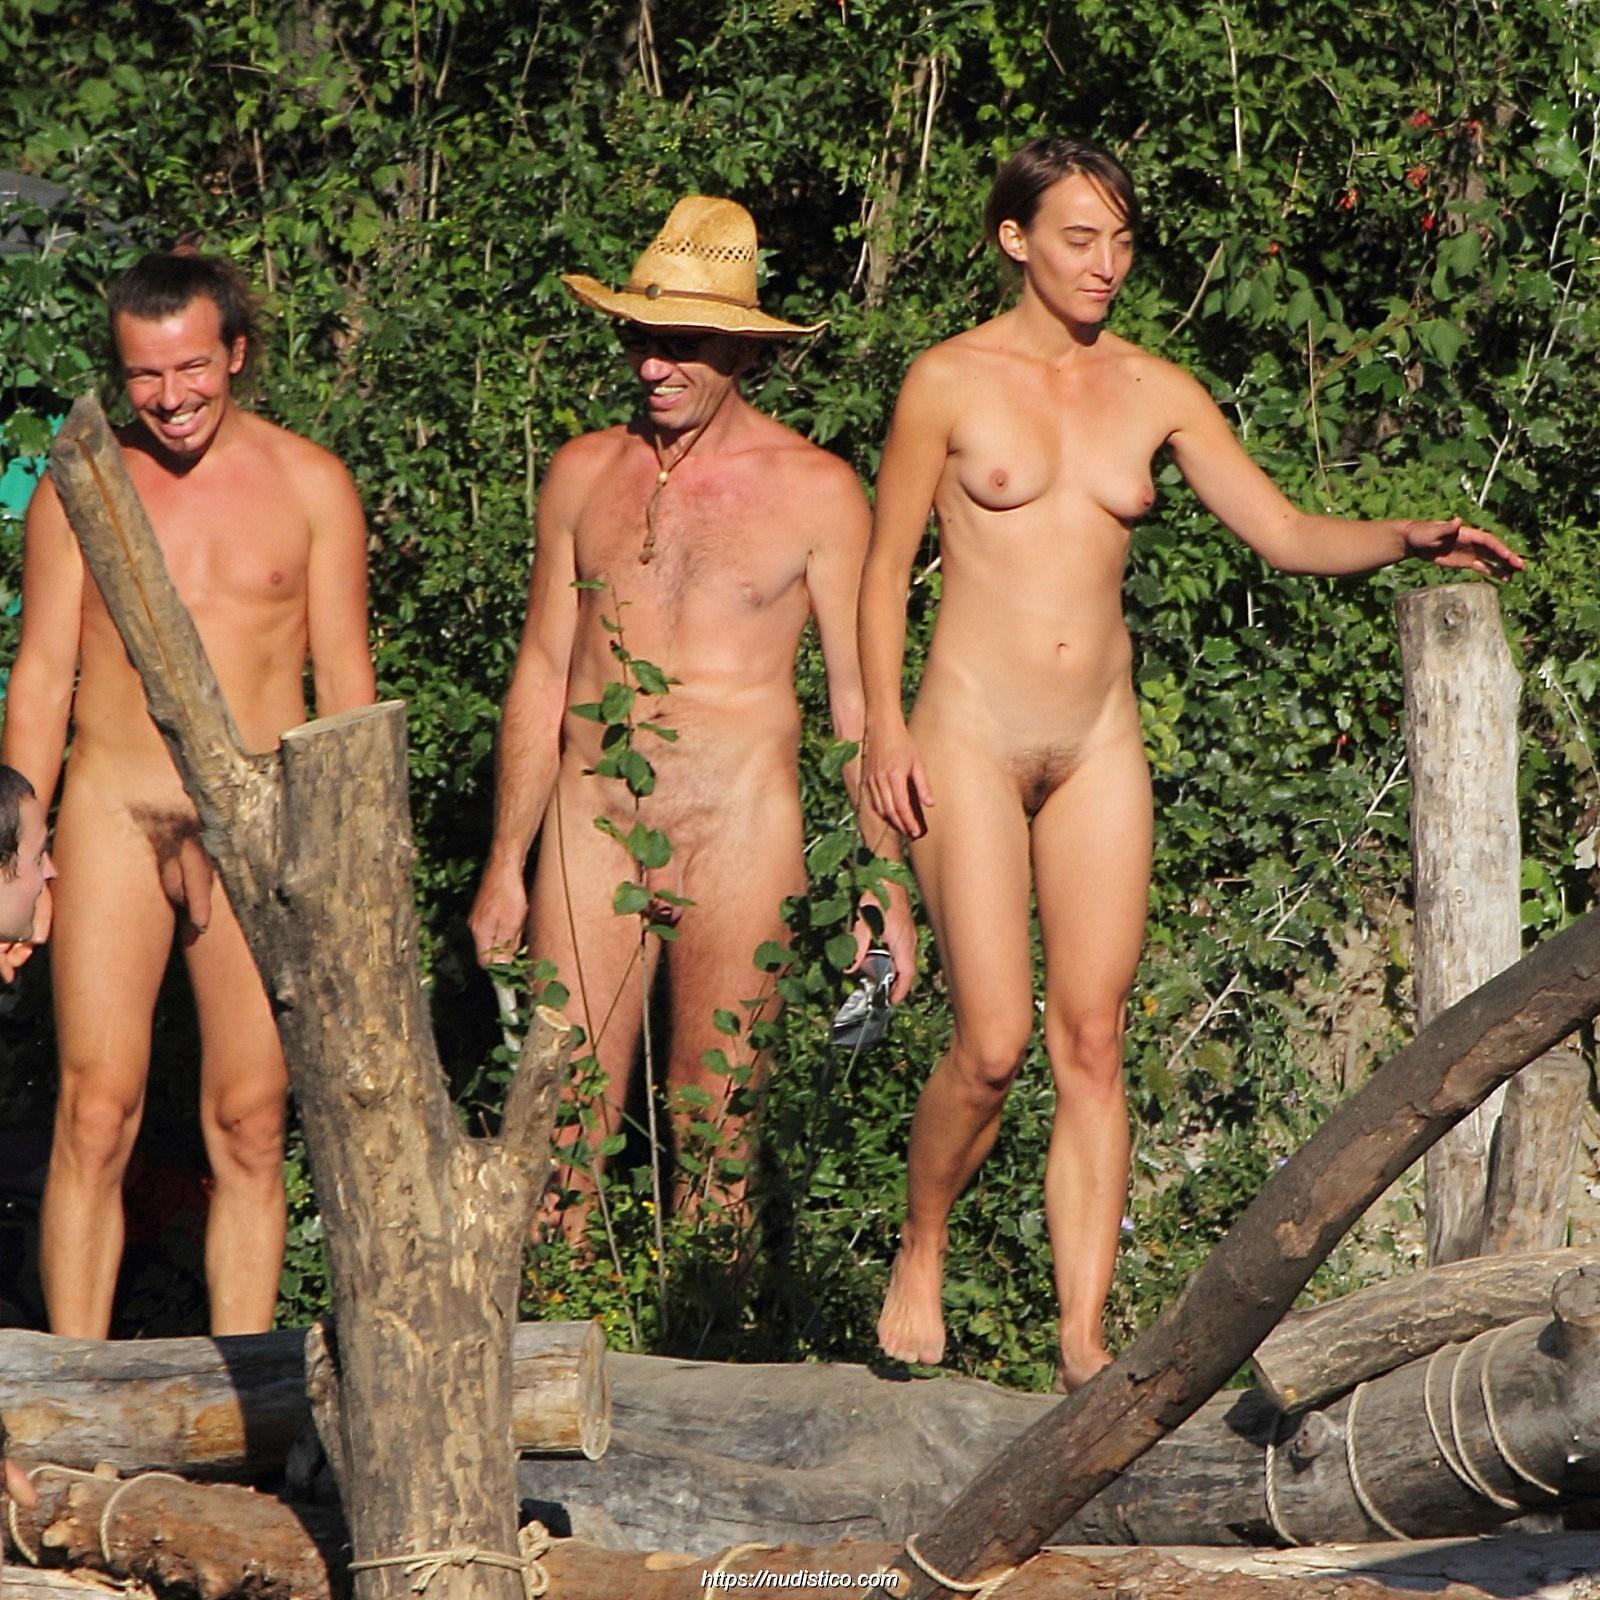 Nudism camp pics